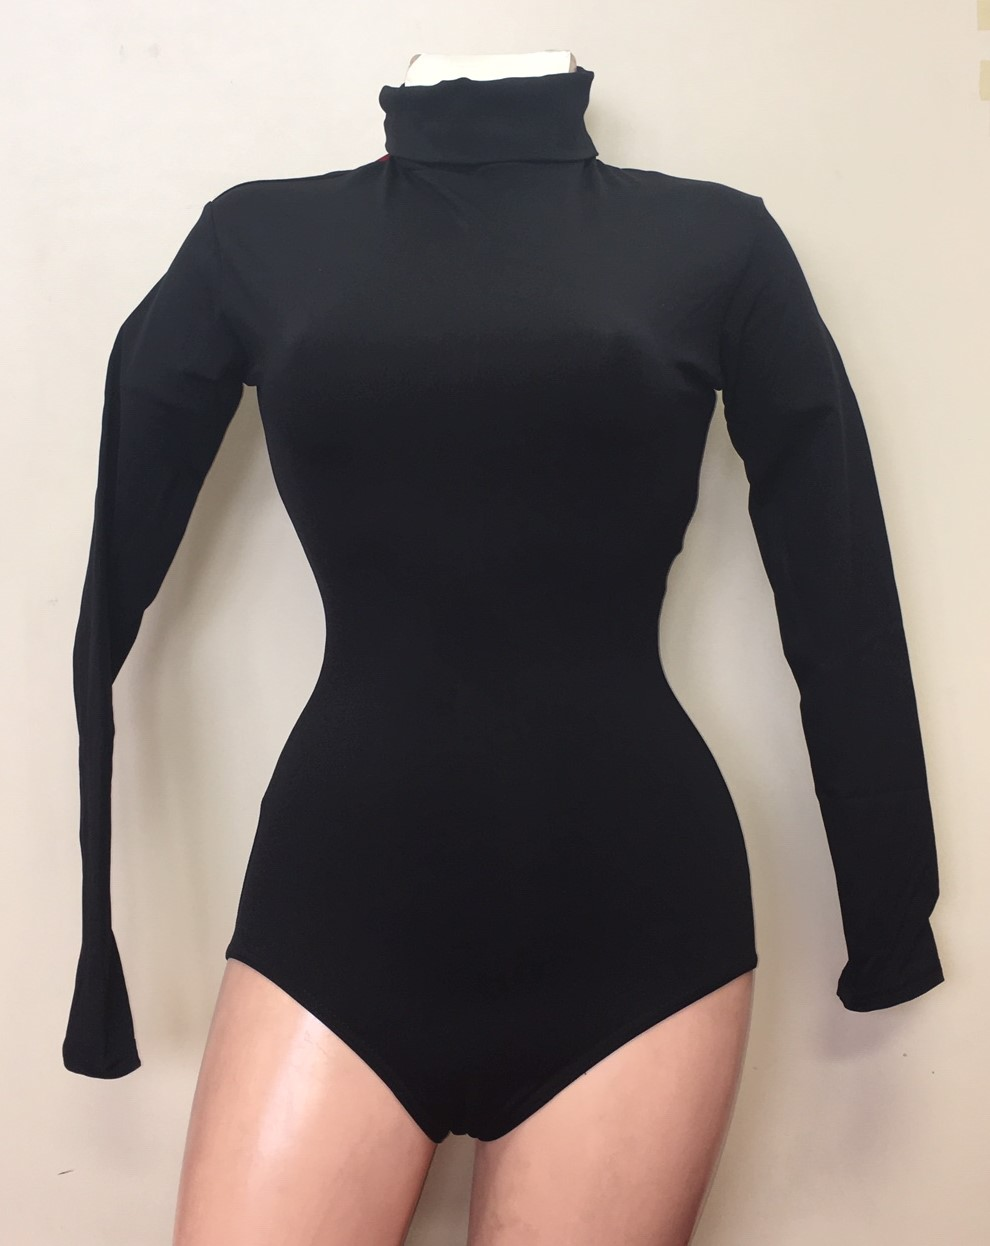 Capezio Women's Long Sleeve Turtleneck Leotard